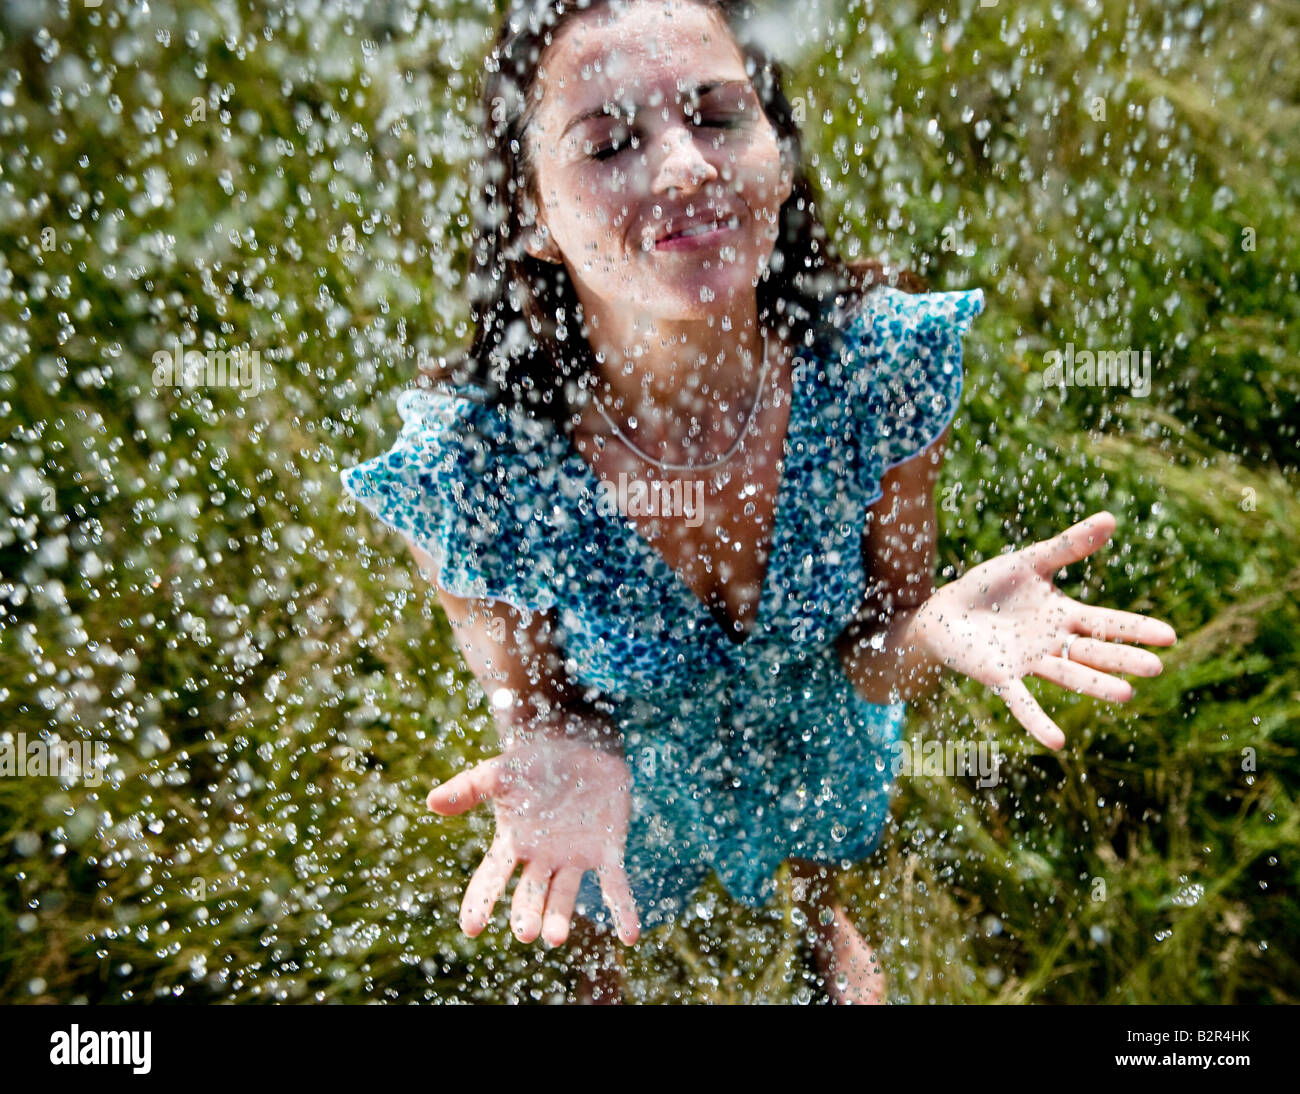 Woman standing in rain - Stock Image